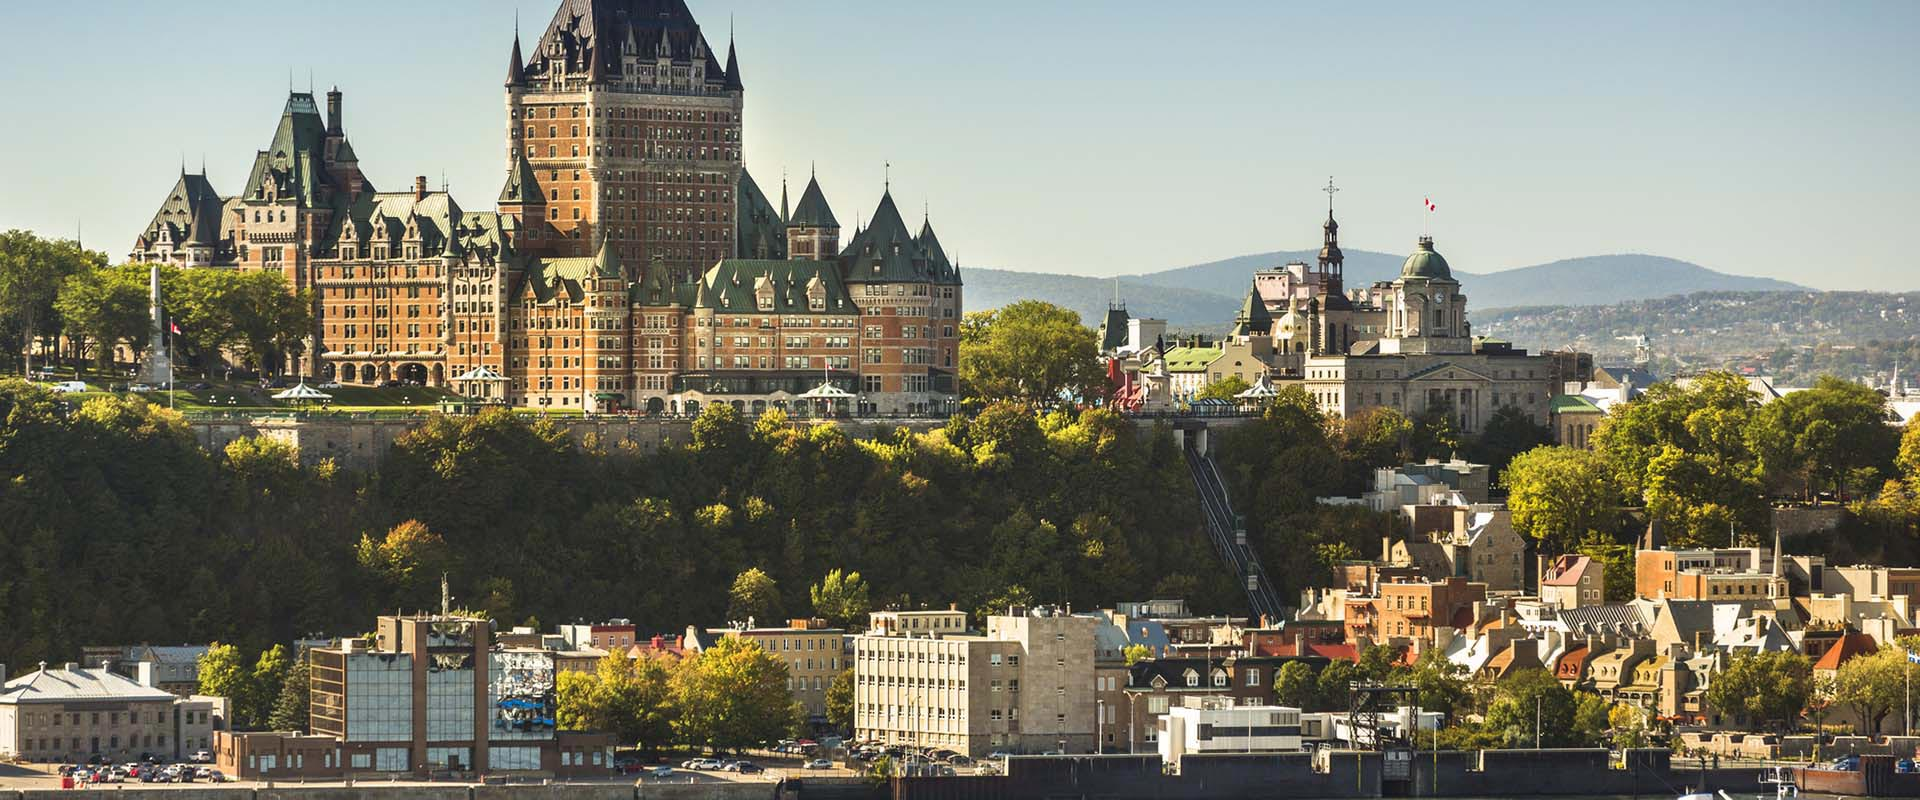 Quebec Public Holidays 2022 - PublicHolidays.net